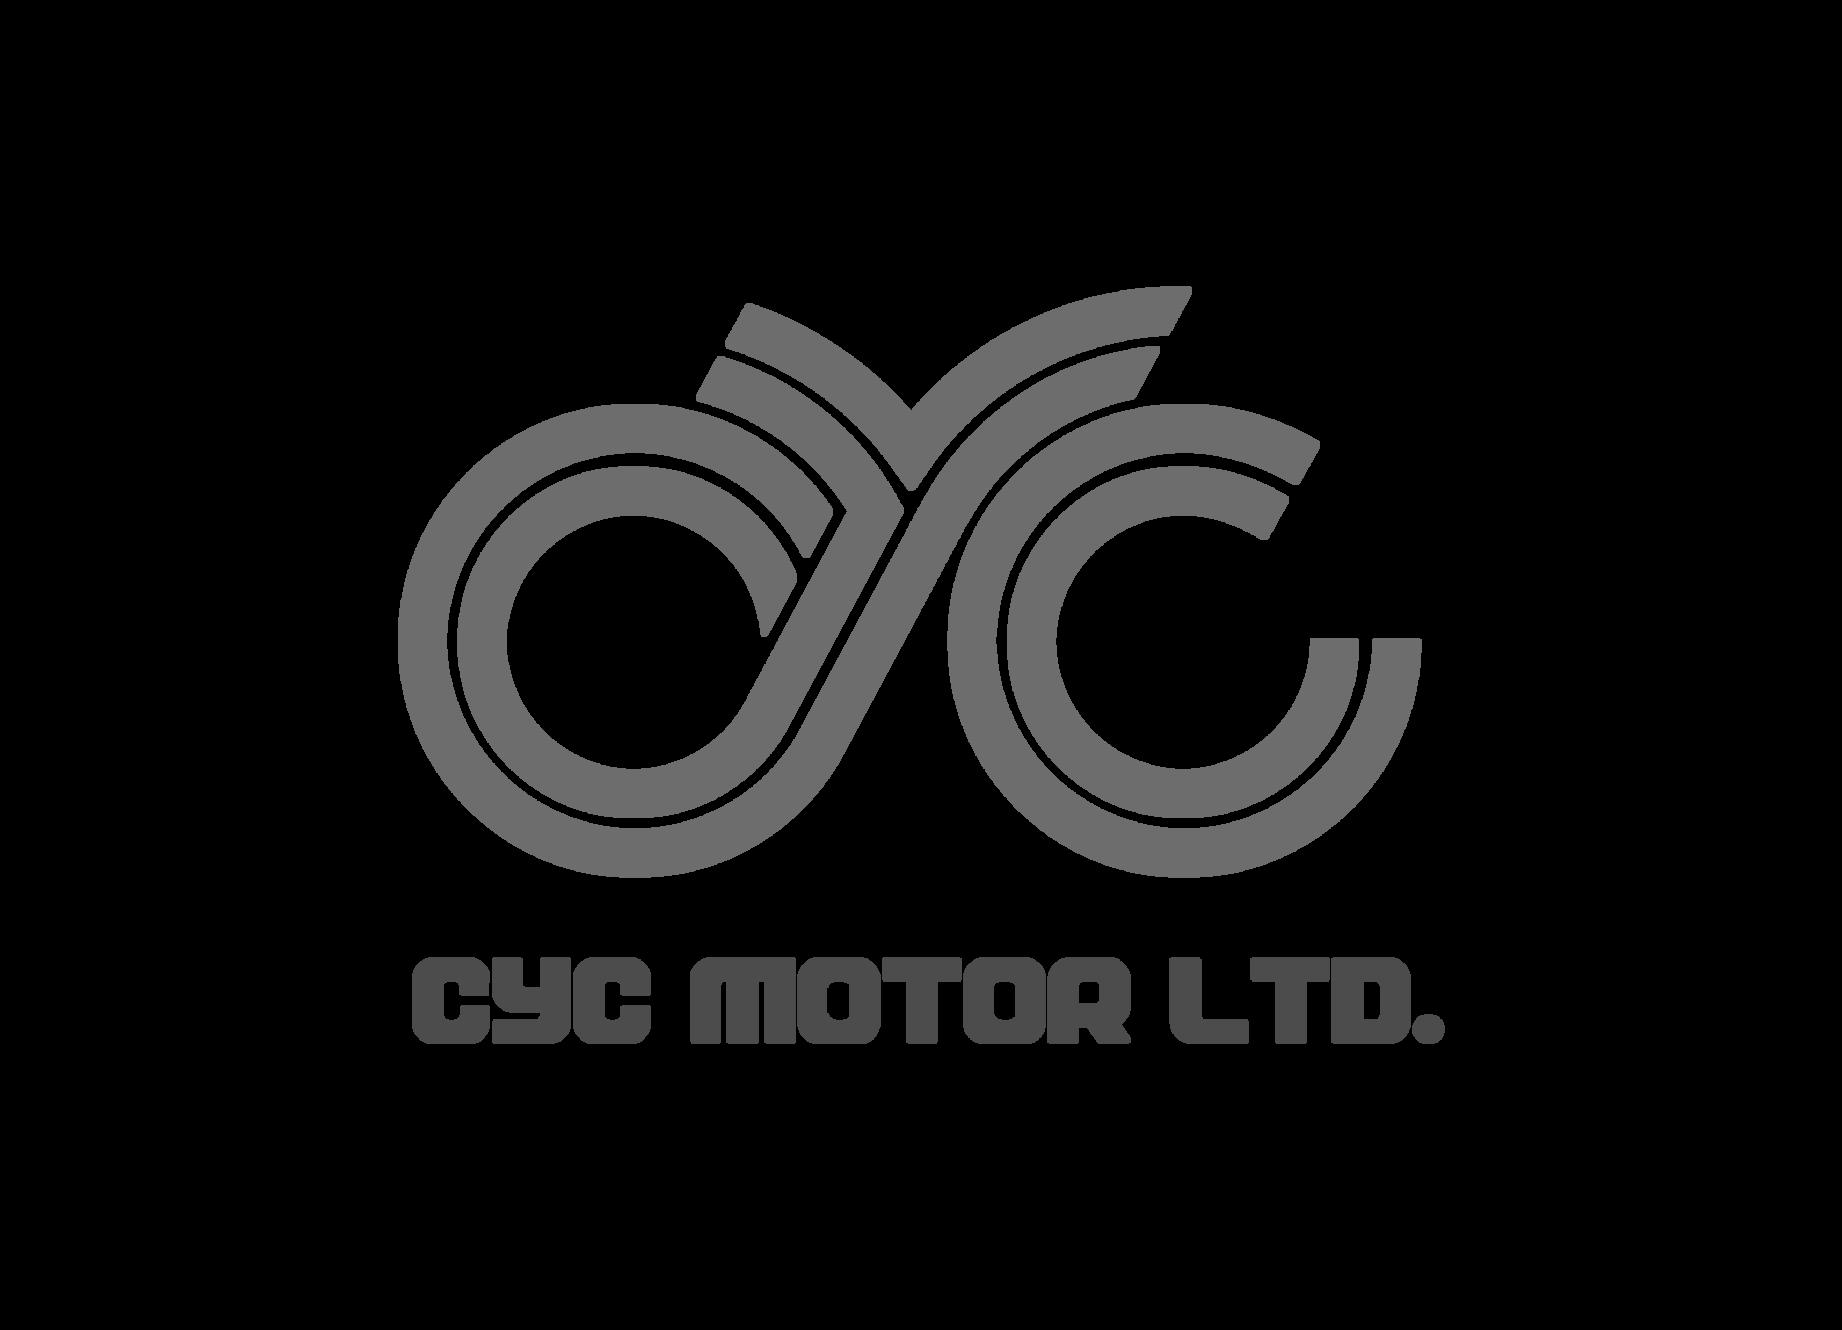 Cyc Motor X1 Pro 3000w Electric Bike Mid Drive System In 2021 Modern Bike Electric Bike Bike Logo